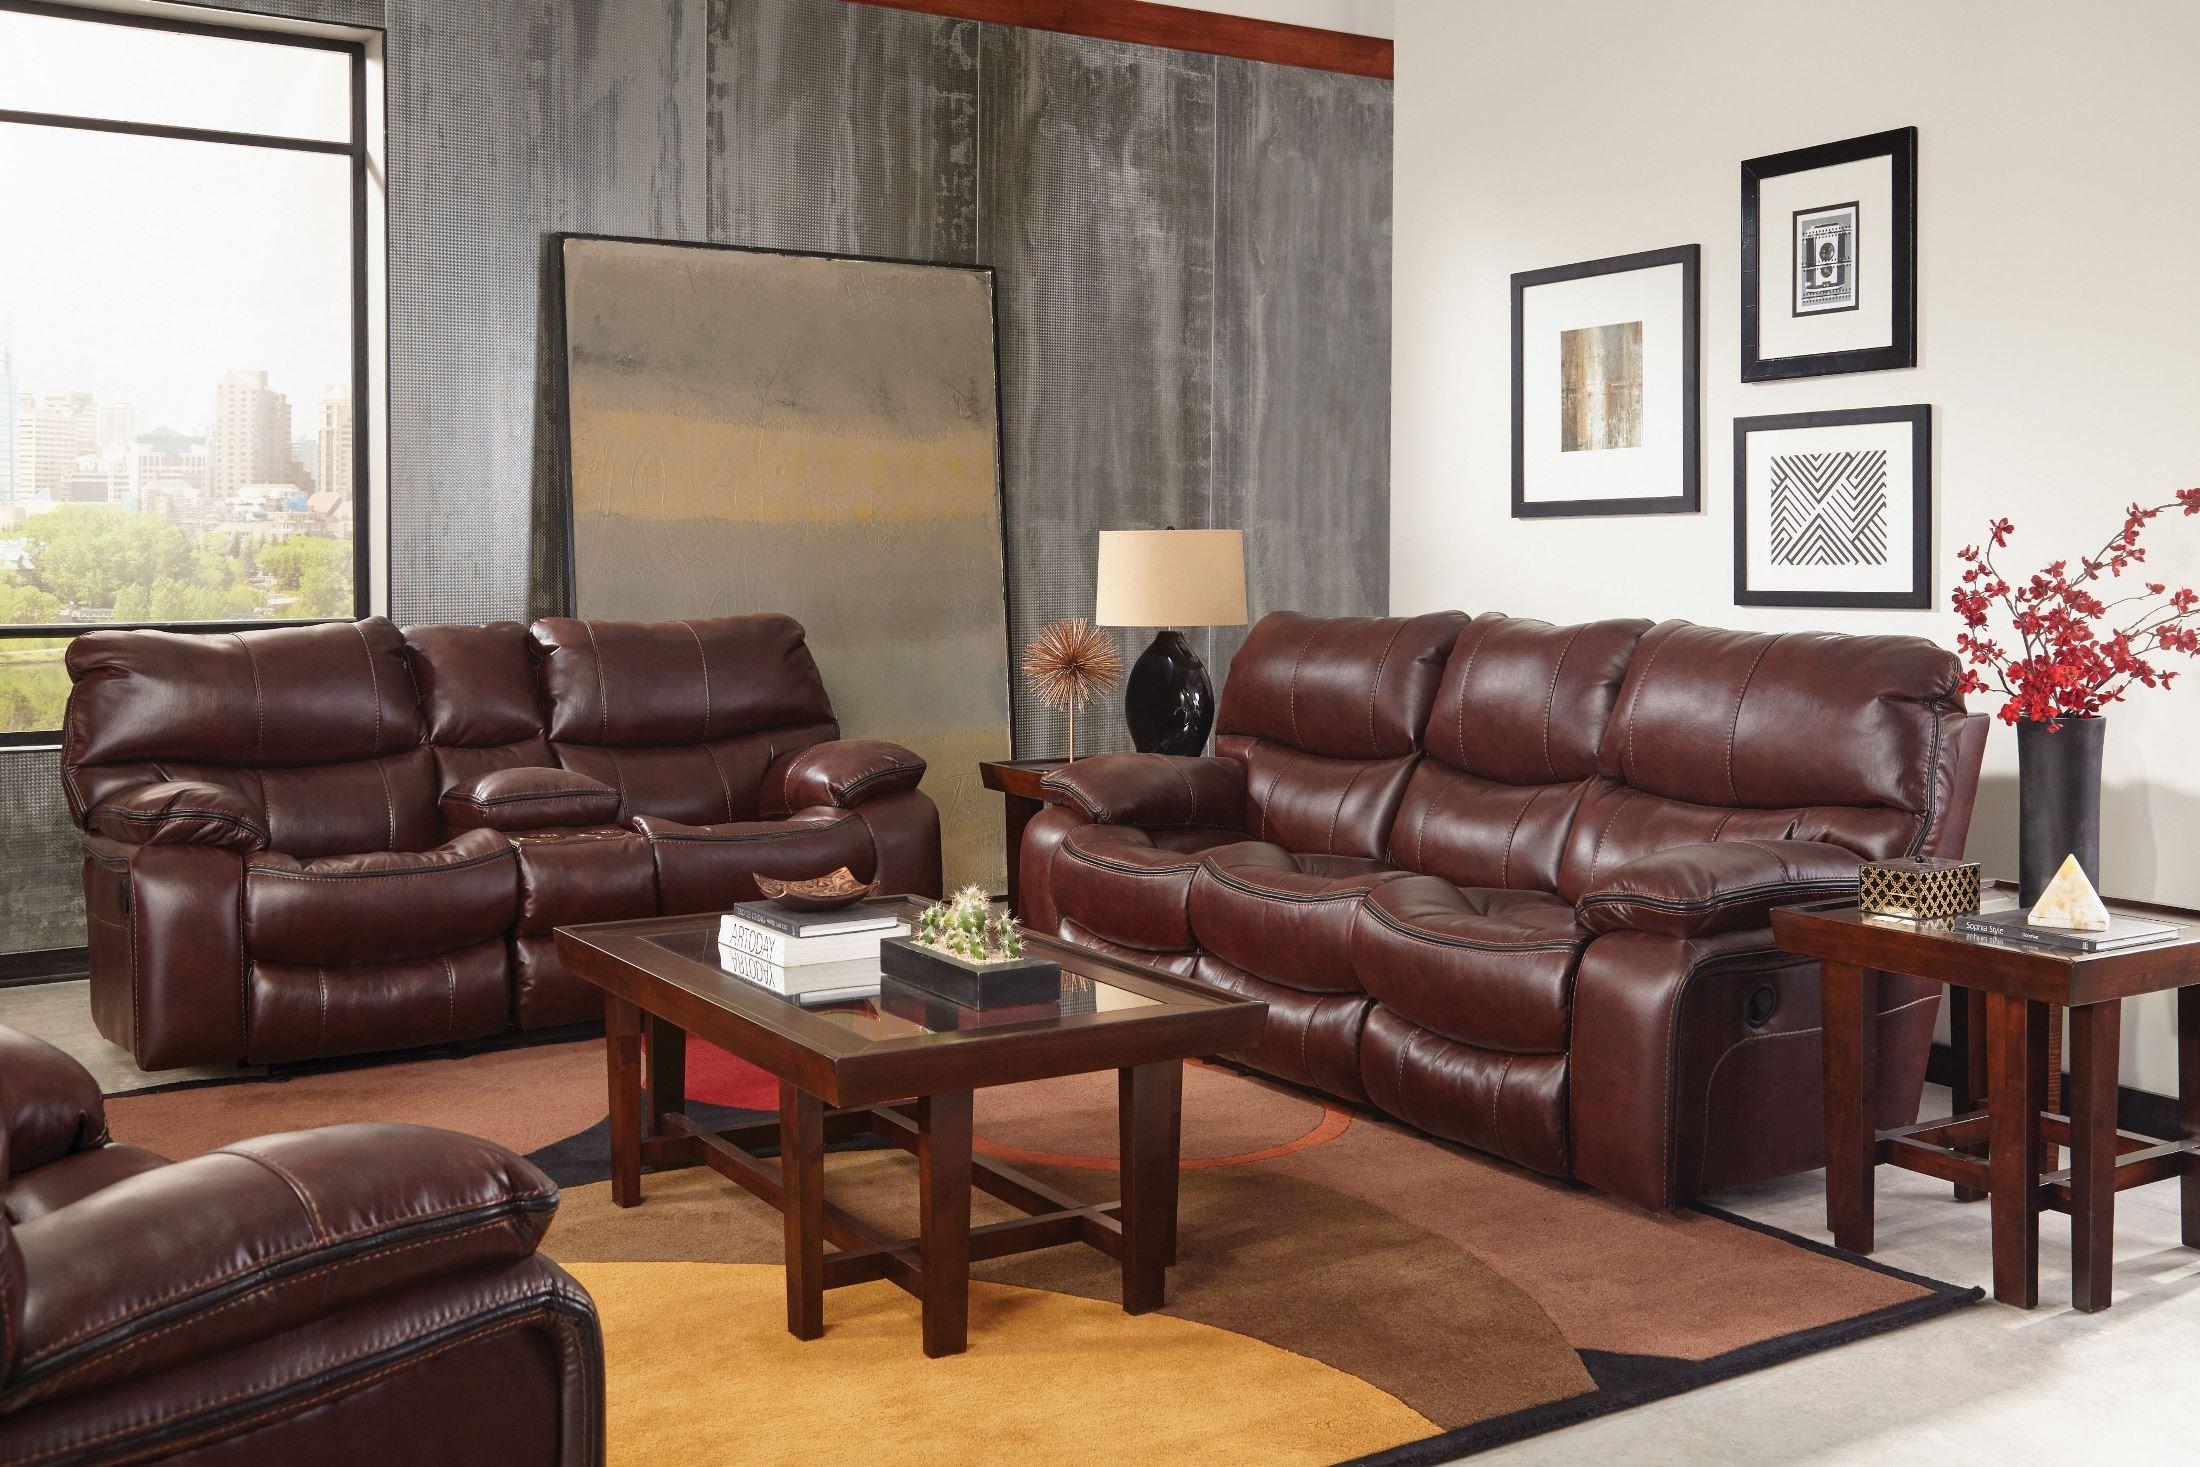 Camden Walnut Power Reclining Living Room Set From Catnapper Coleman Furniture